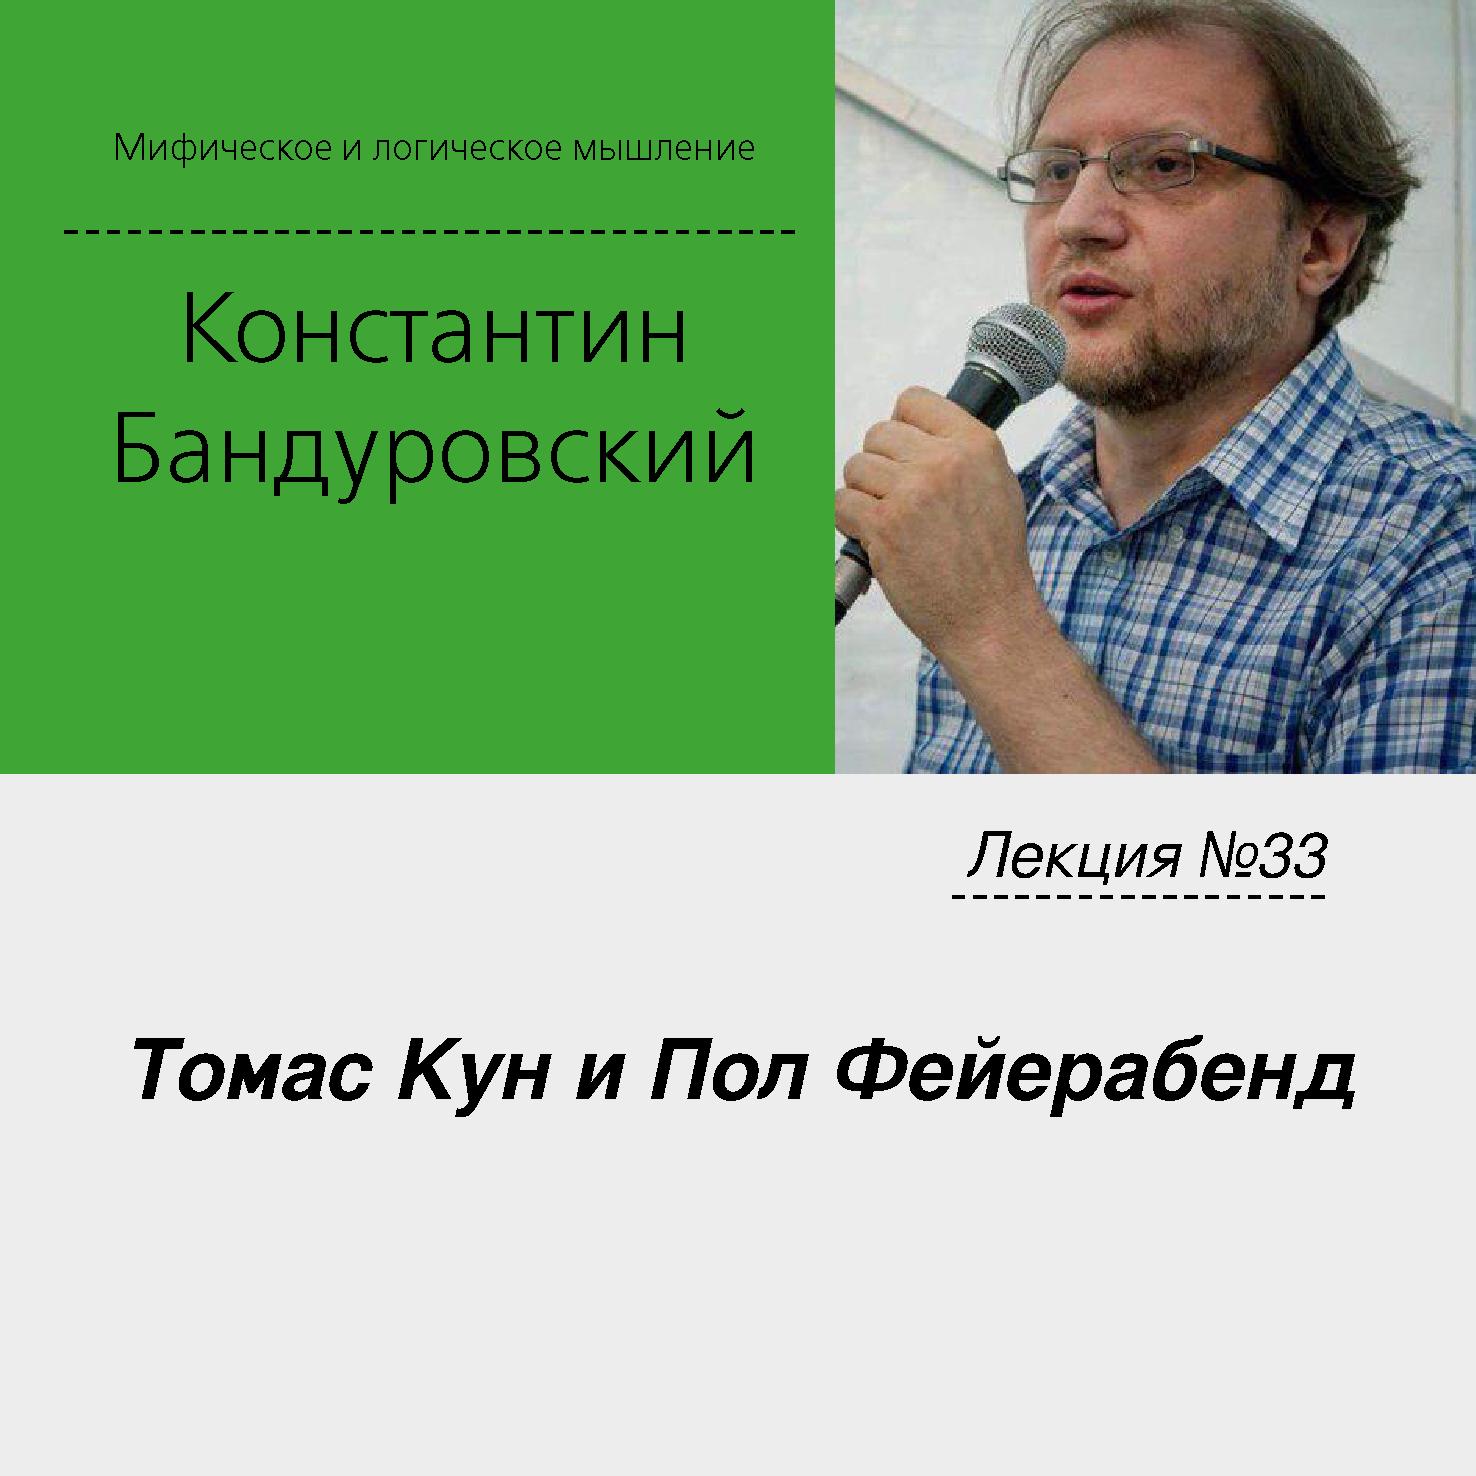 Лекция №33 «Томас Кун и Пол Фейерабенд»